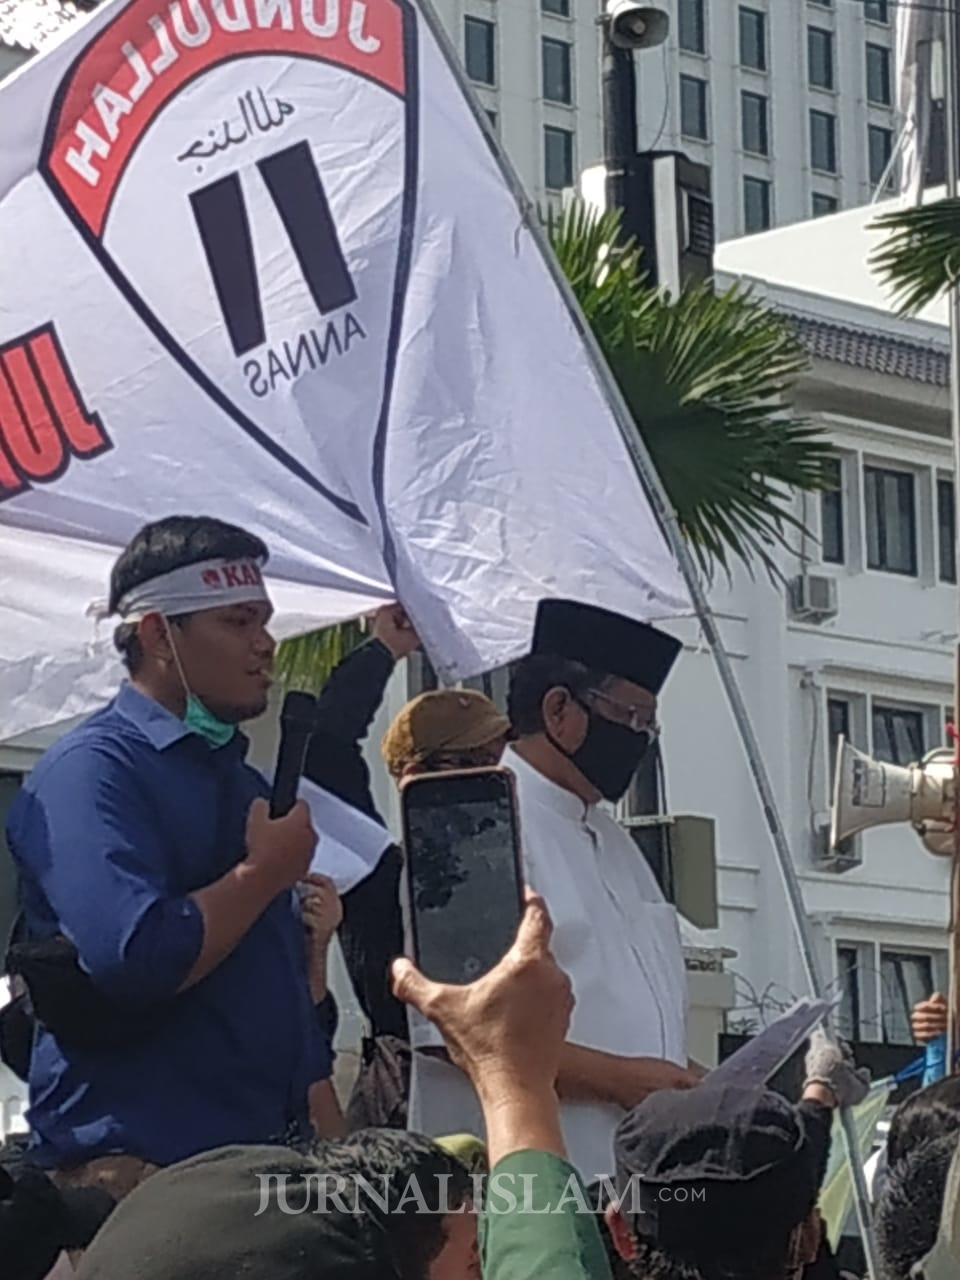 Kiai Athian Ali Heran, Pancasila Diam-diam Mau Diubah di Tengah Pandemi